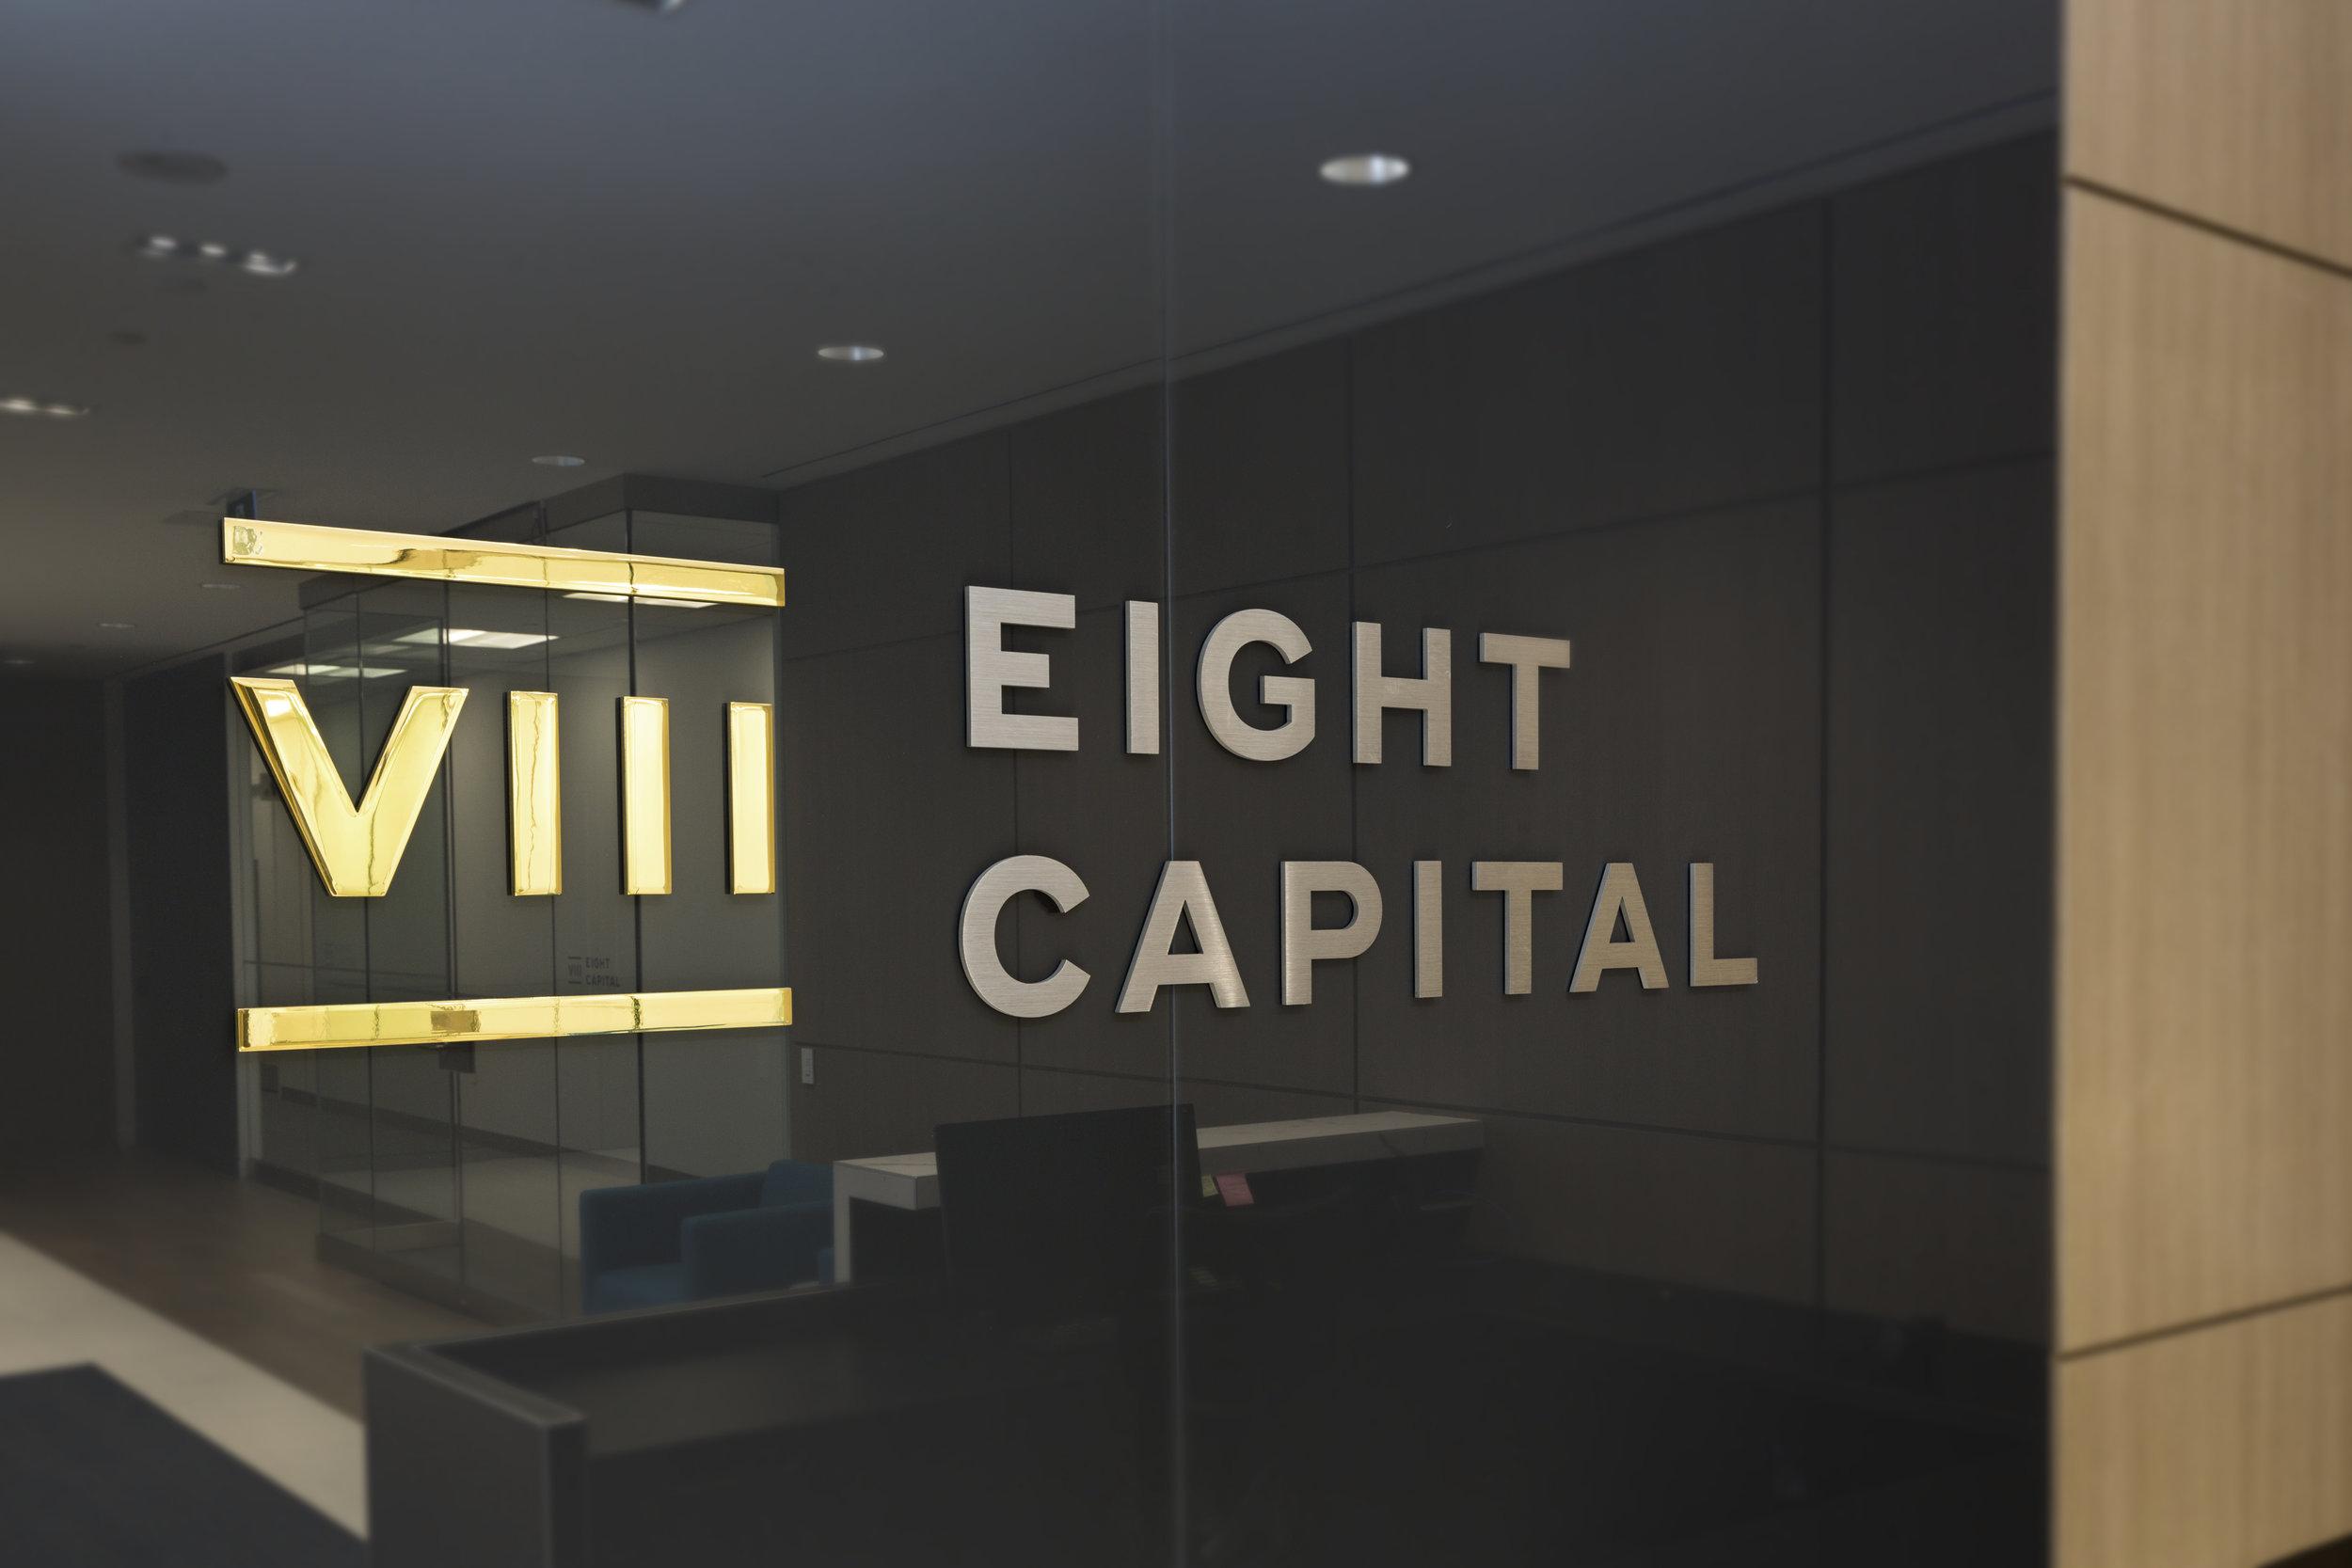 VIIIcapital5